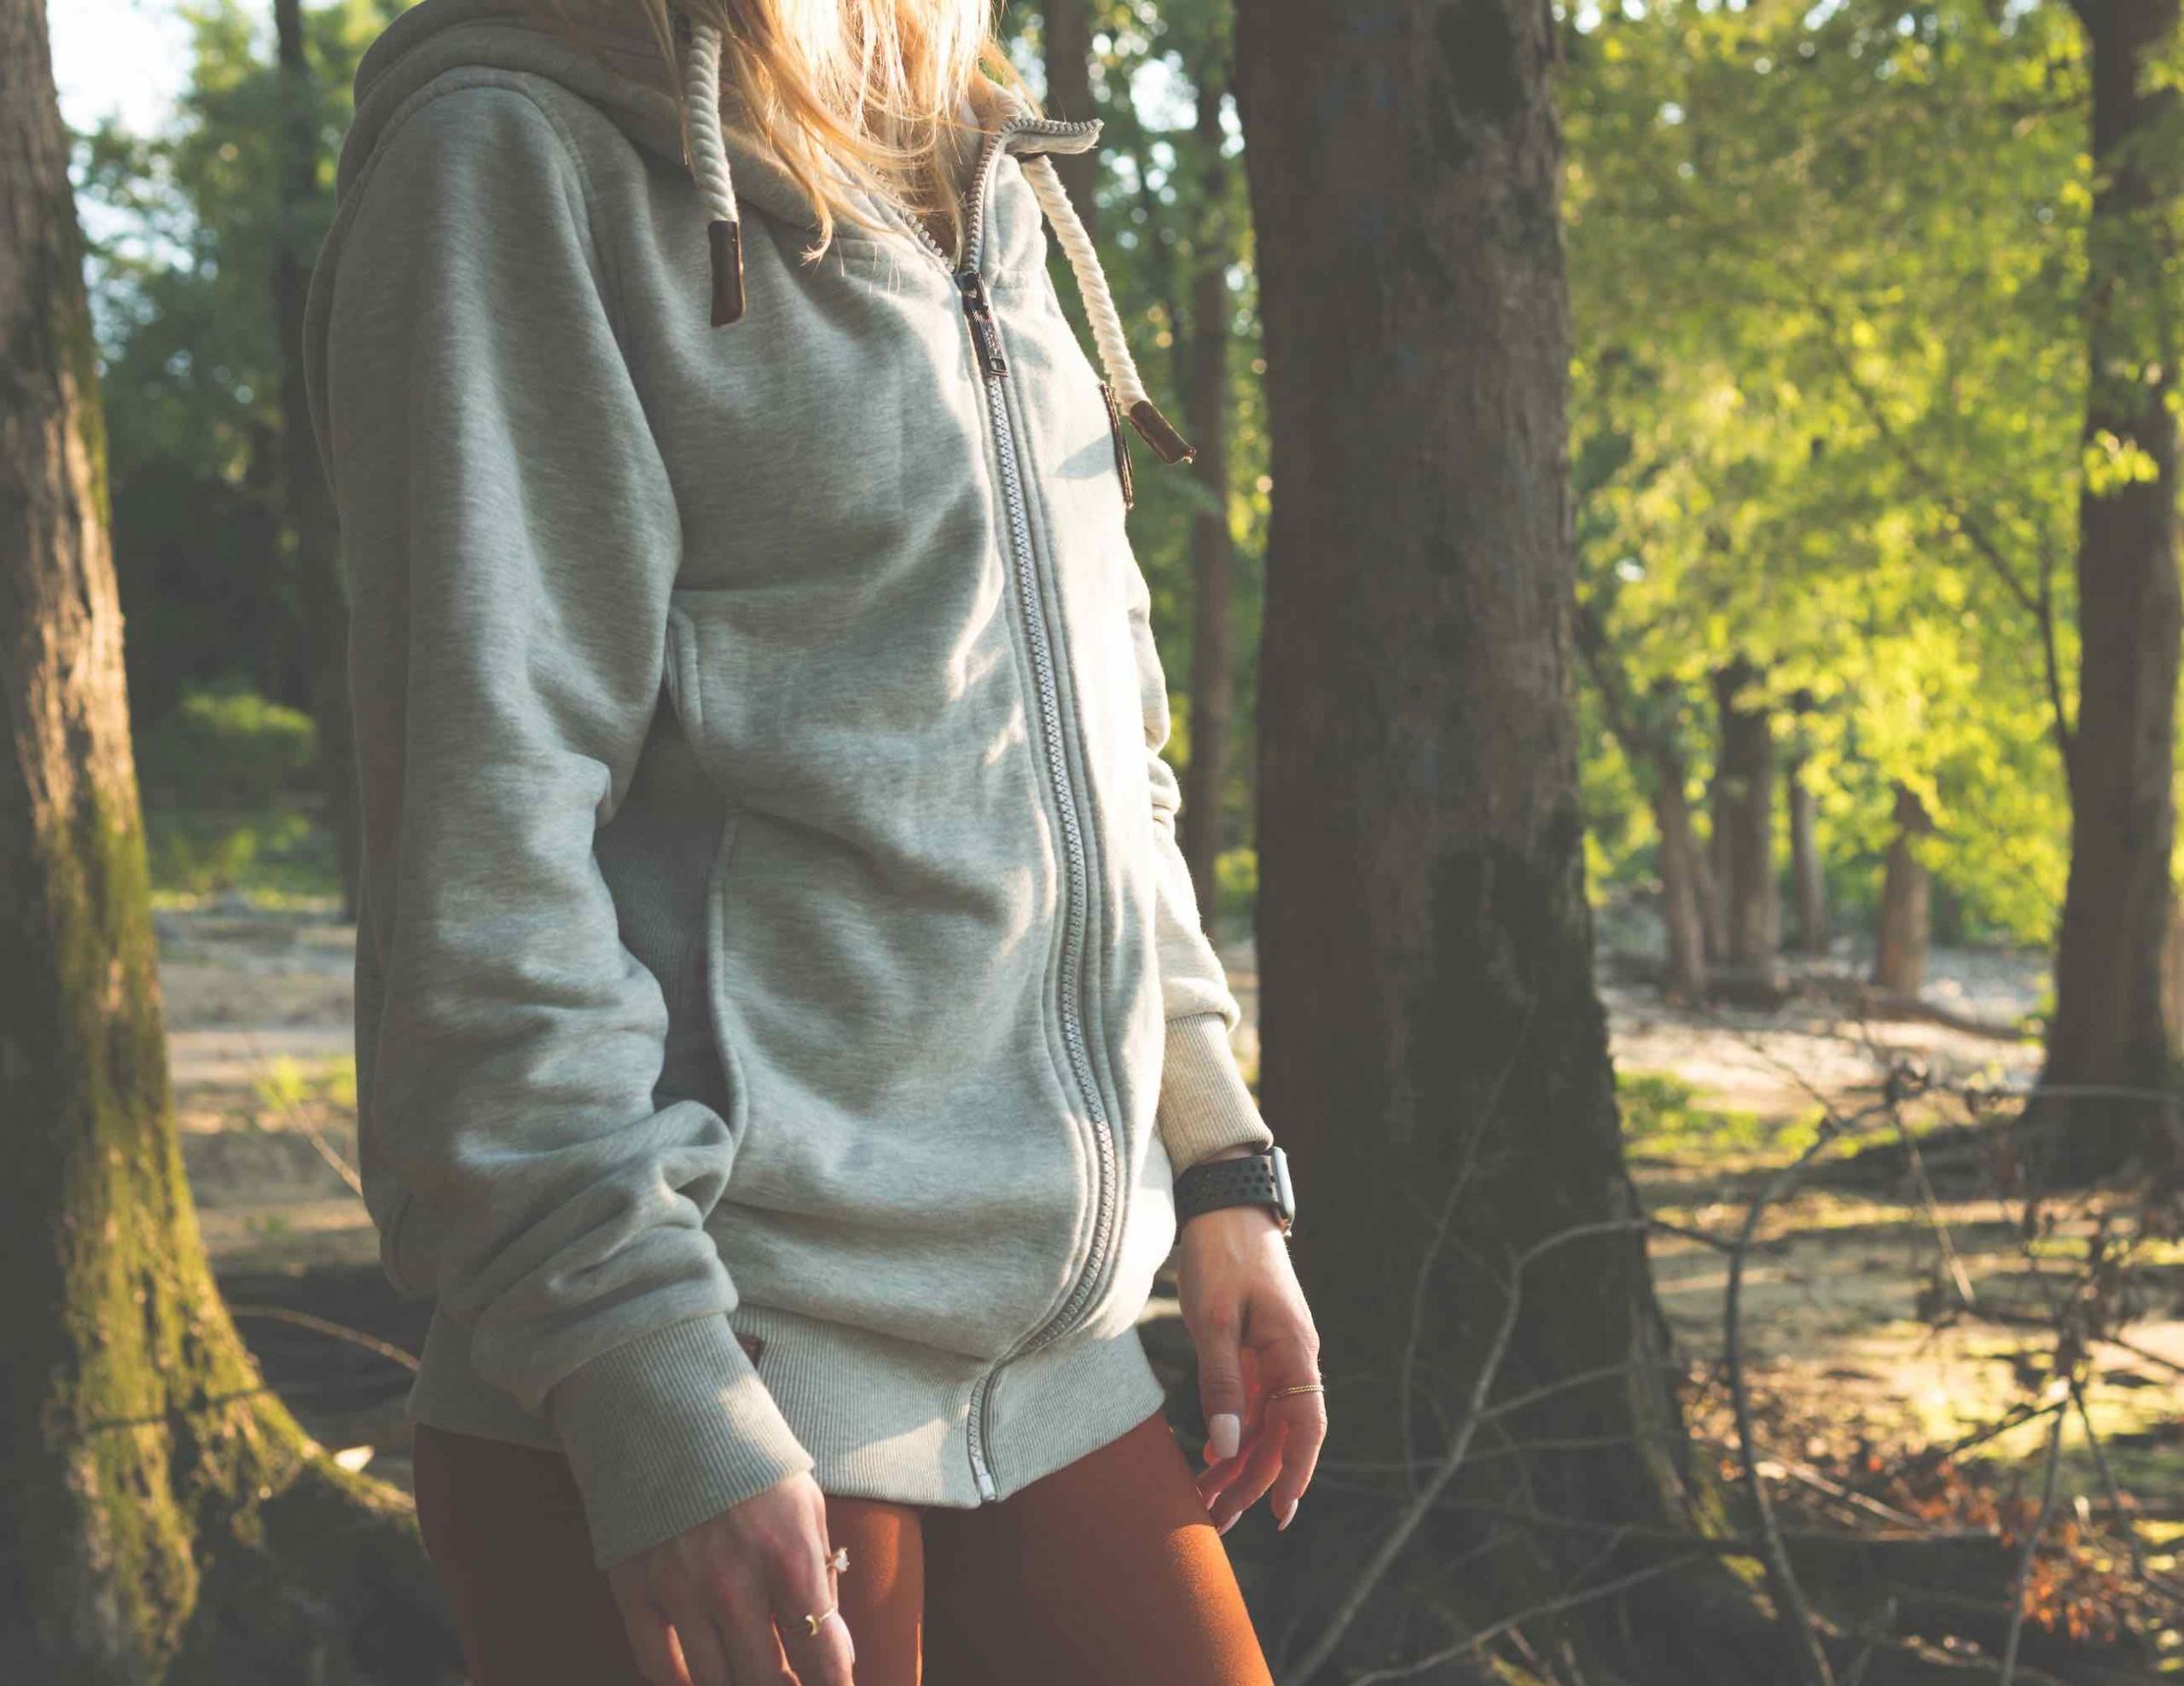 LiveWarm Self-Adjusting Heated Clothing